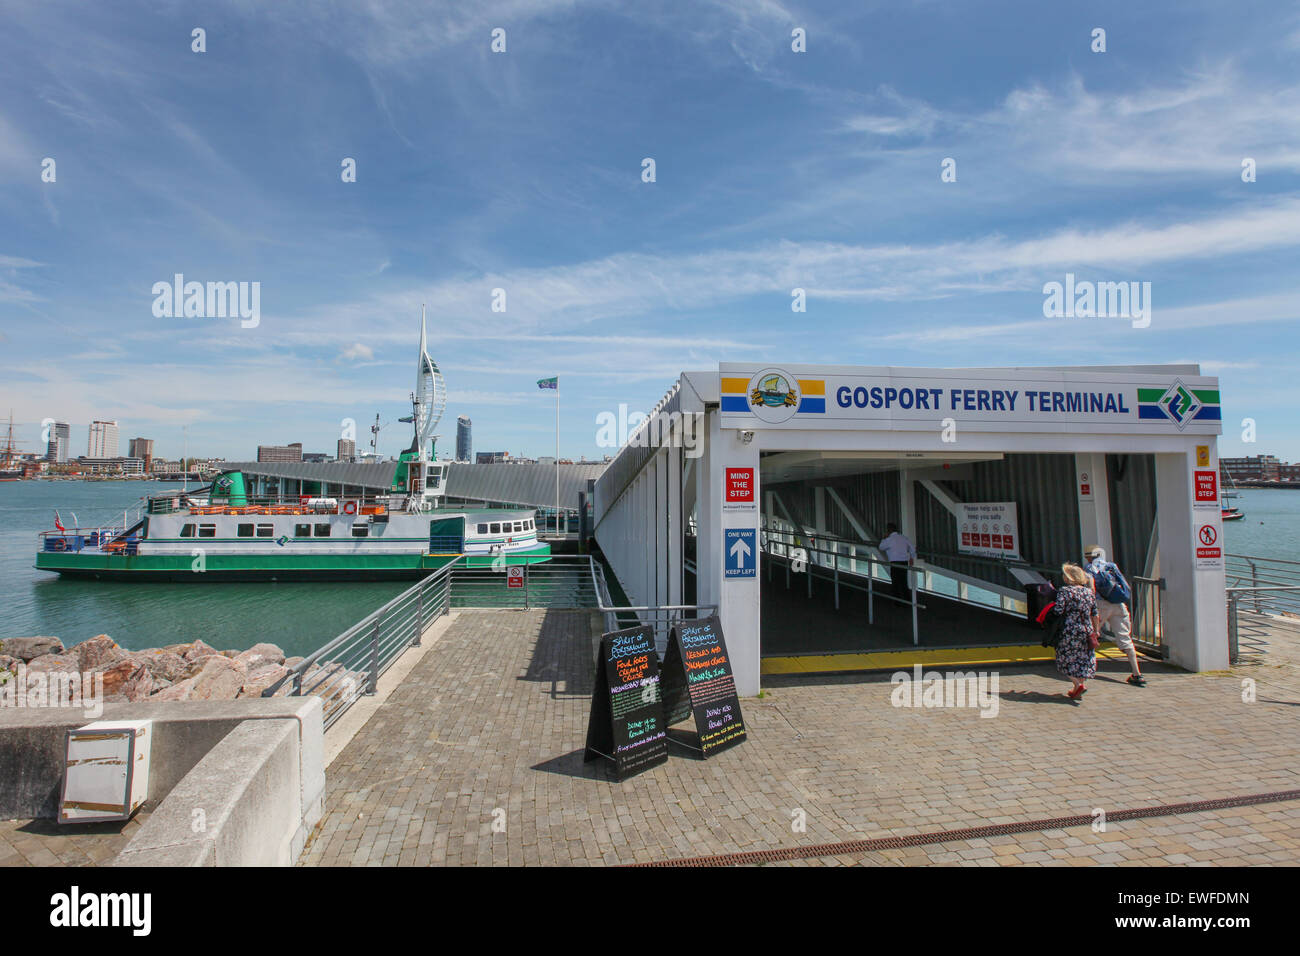 Gosport Ferry Terminal, Gosport, UK - Stock Image